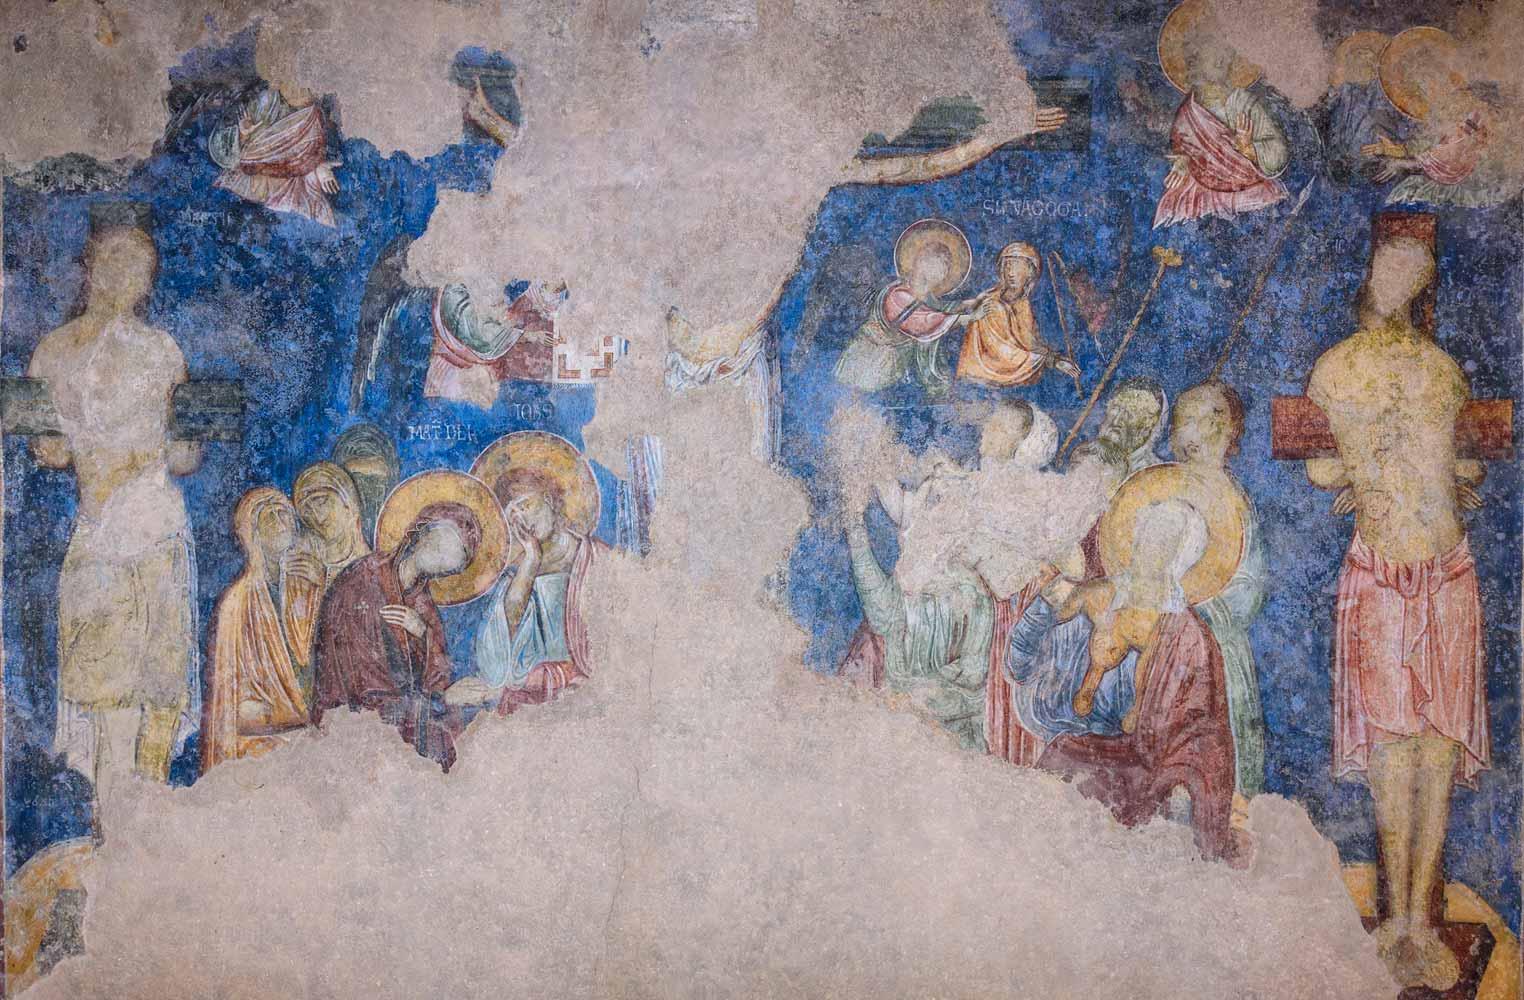 monastery-abu-gosh-crucifixion